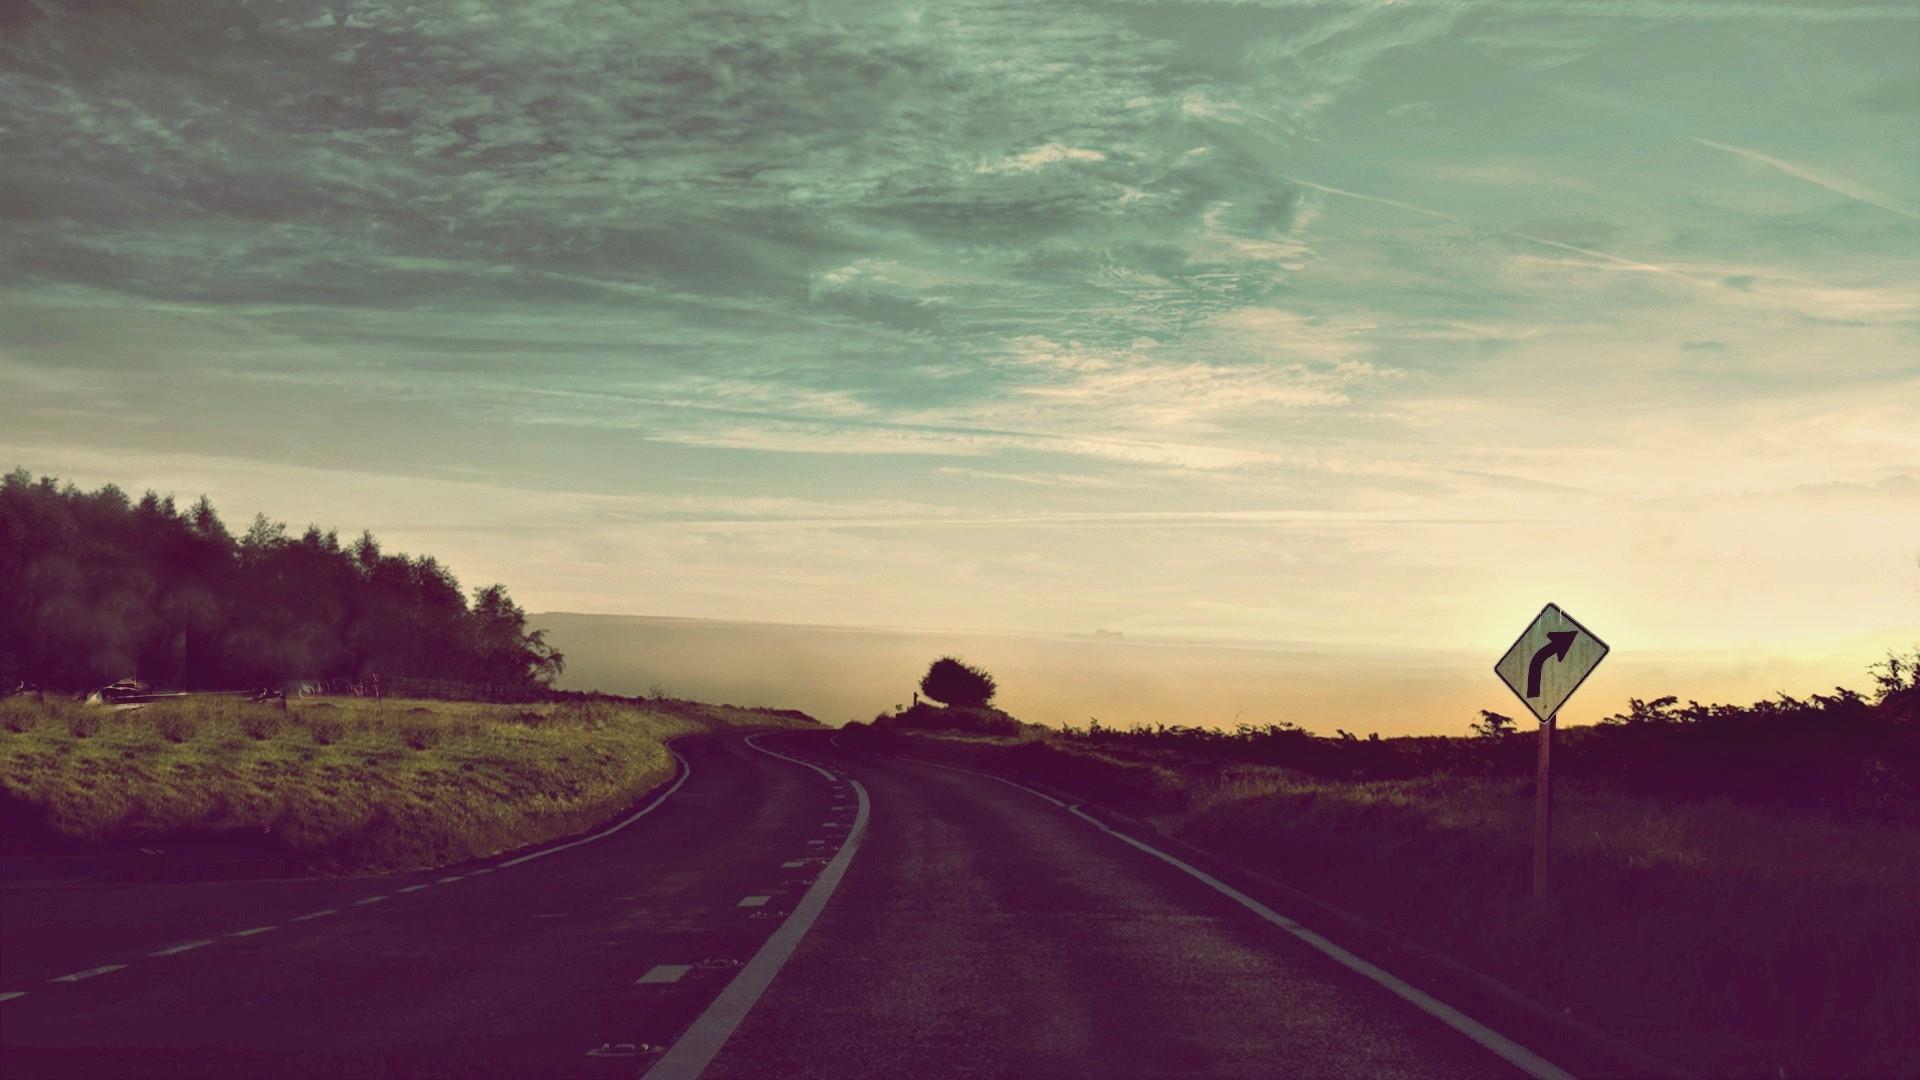 Download. Description wallpaper: Tumblr Nature Backgrounds ...